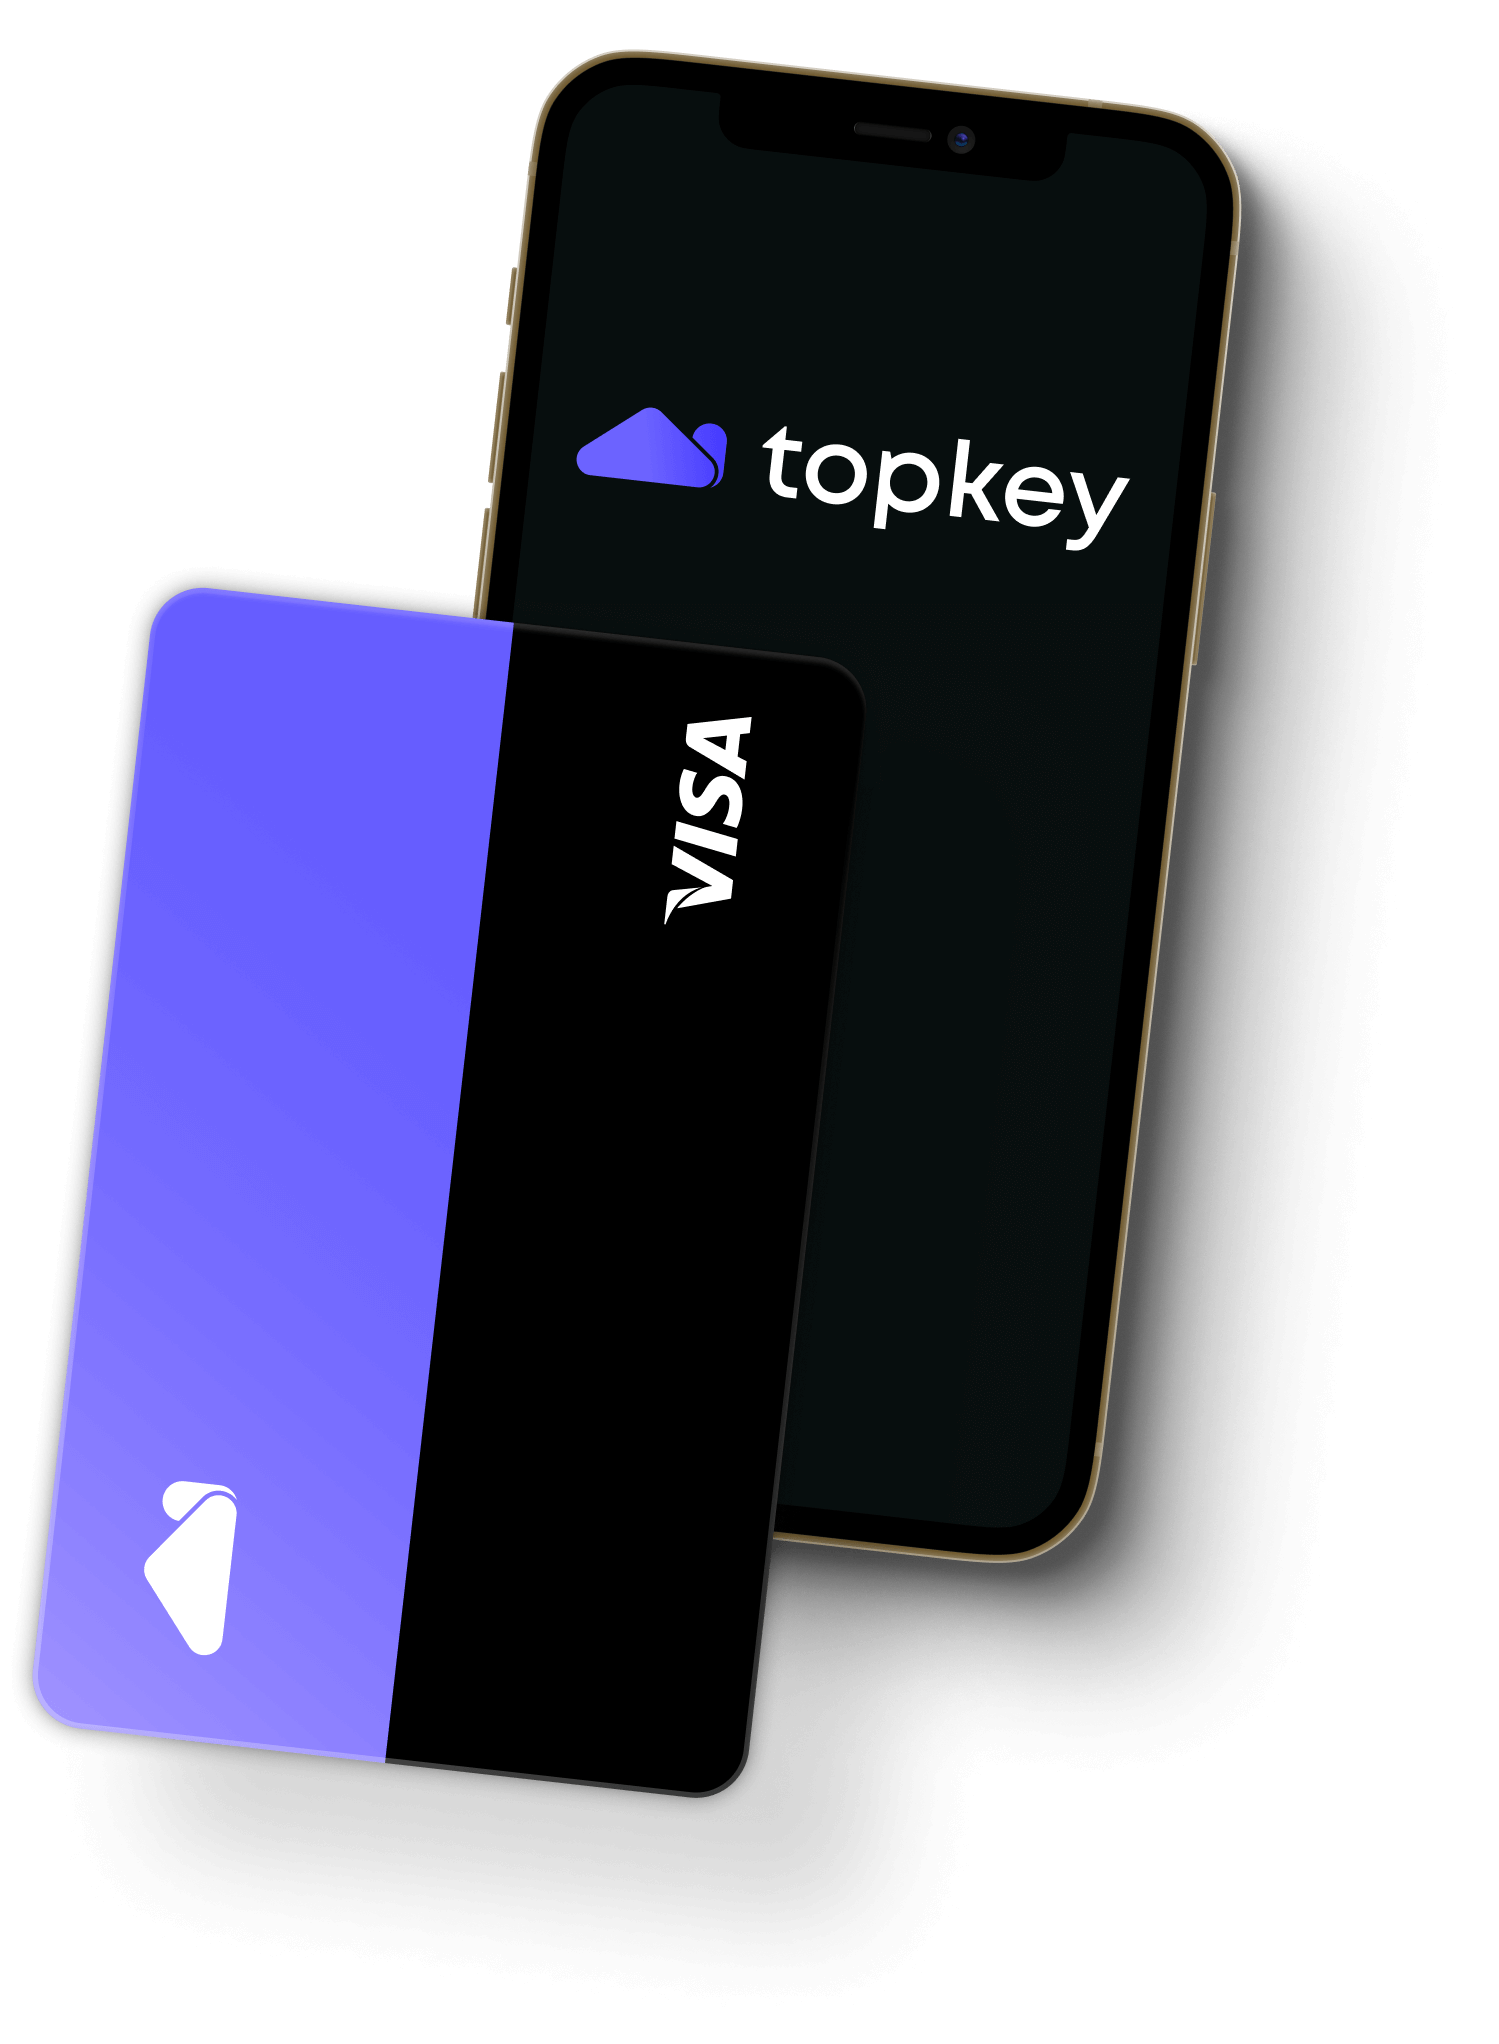 Topkey_card+mobile_app